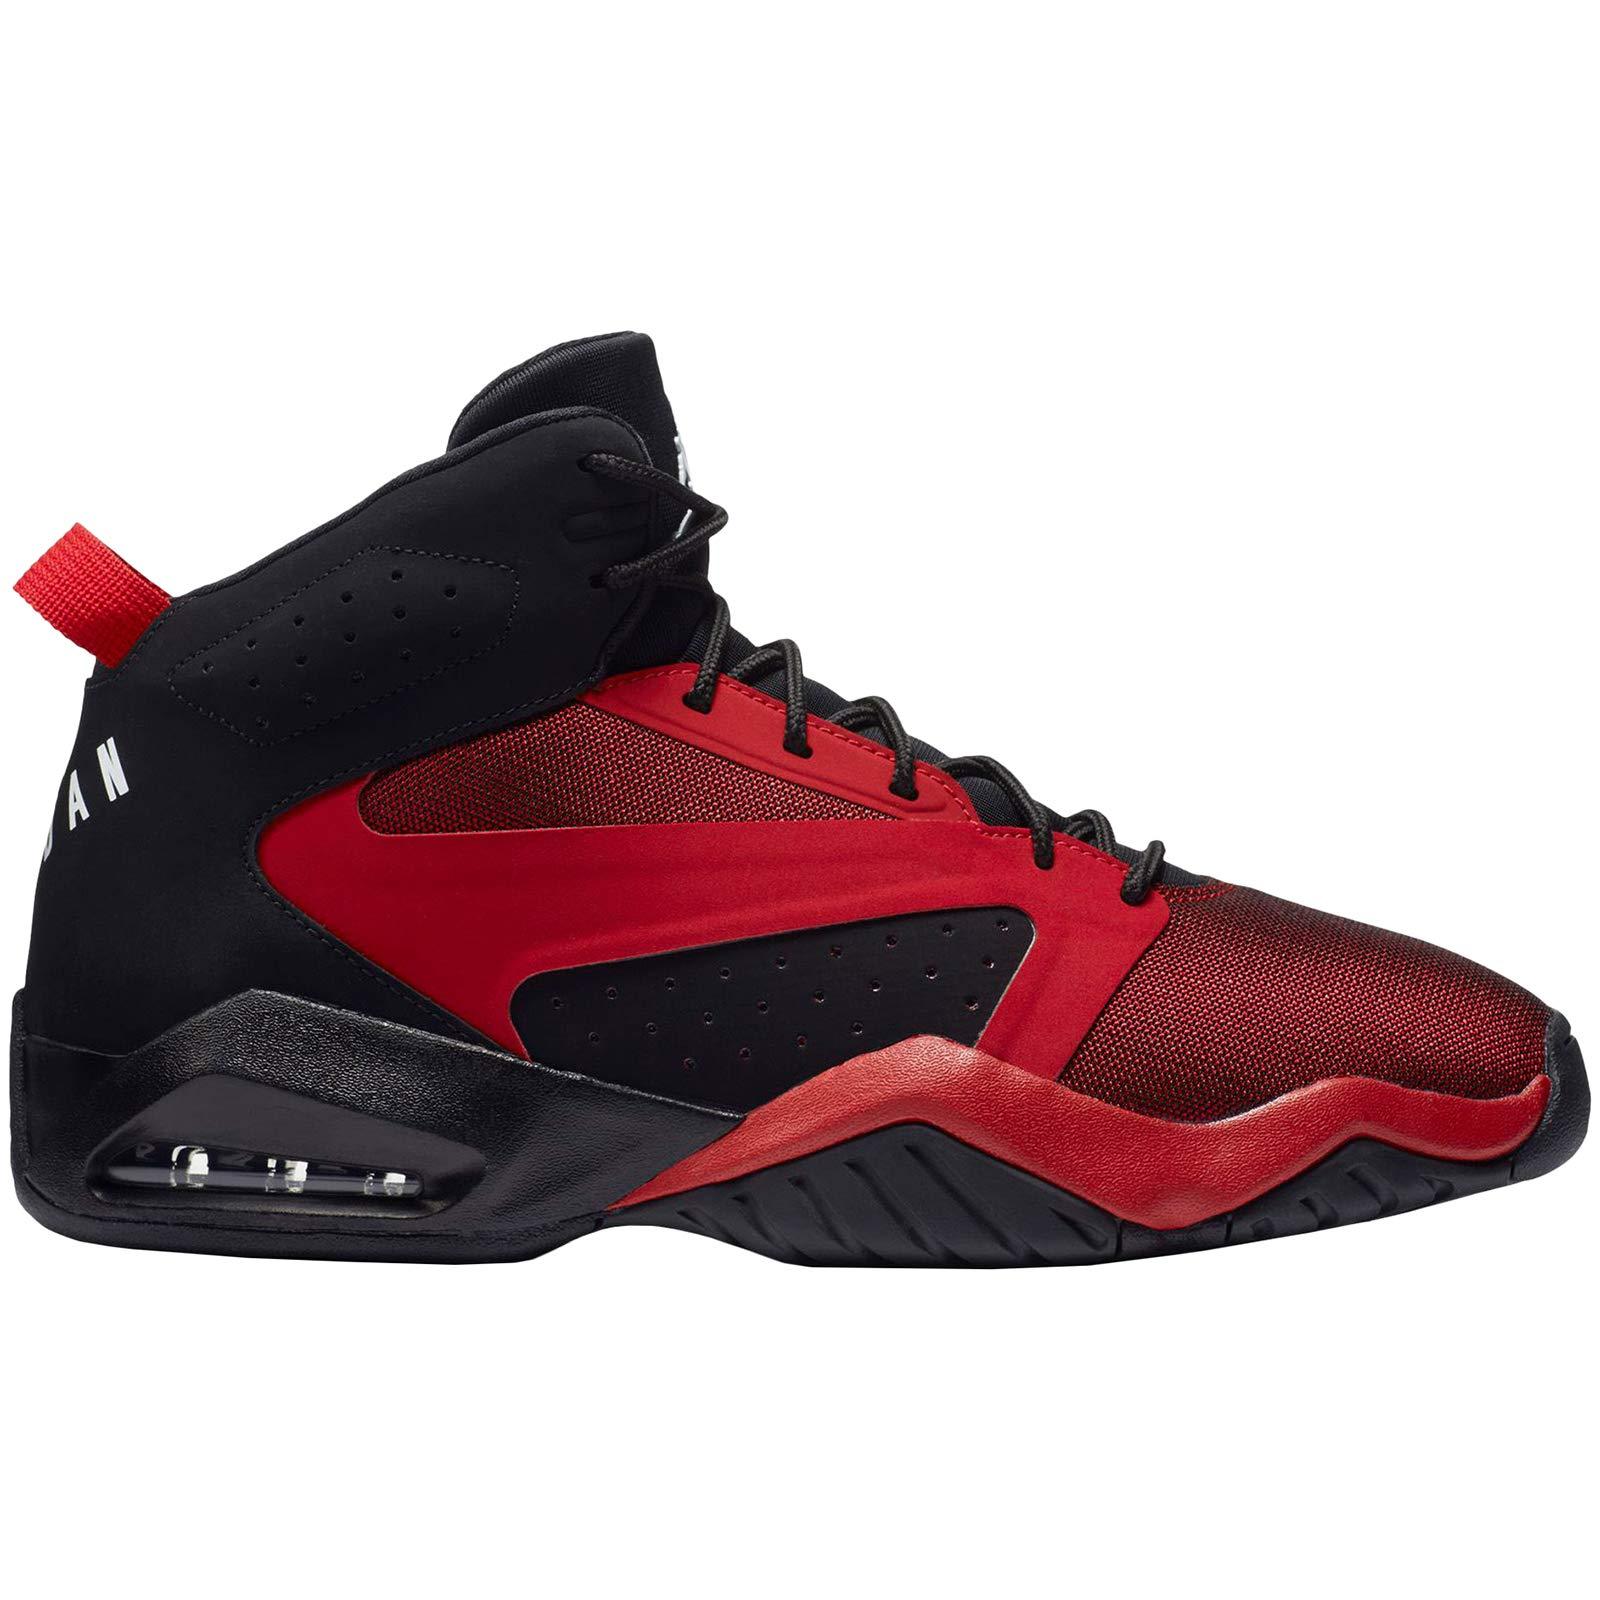 Jordan Mens Lift Off Black Gym RED White Size 8